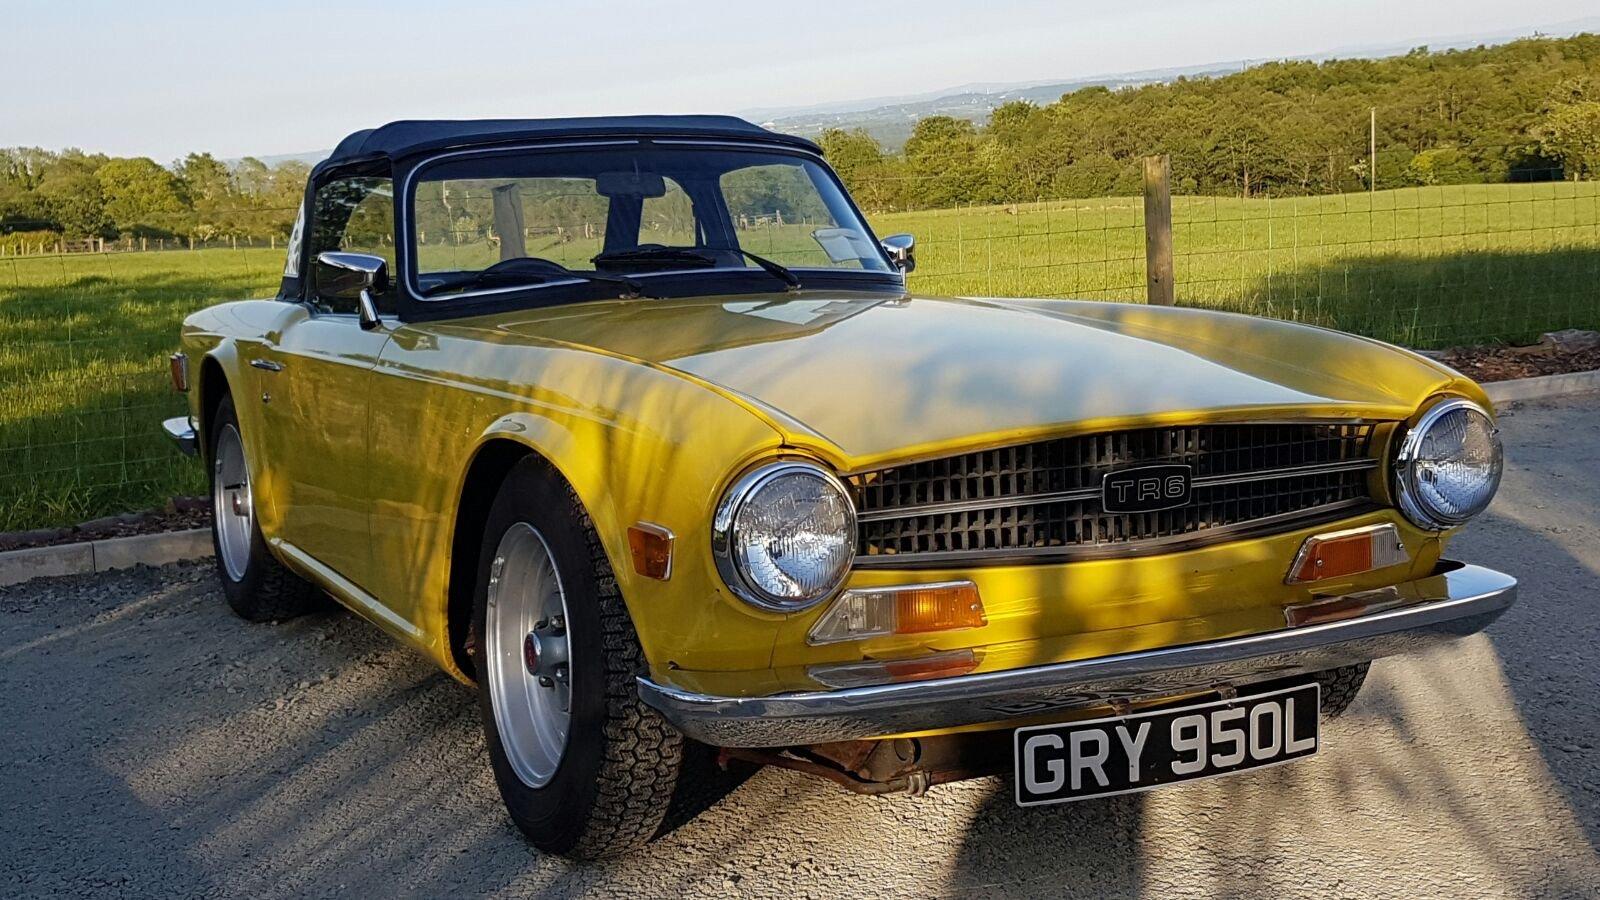 1972 Triumph TR6  - UK Car For Sale (picture 5 of 5)